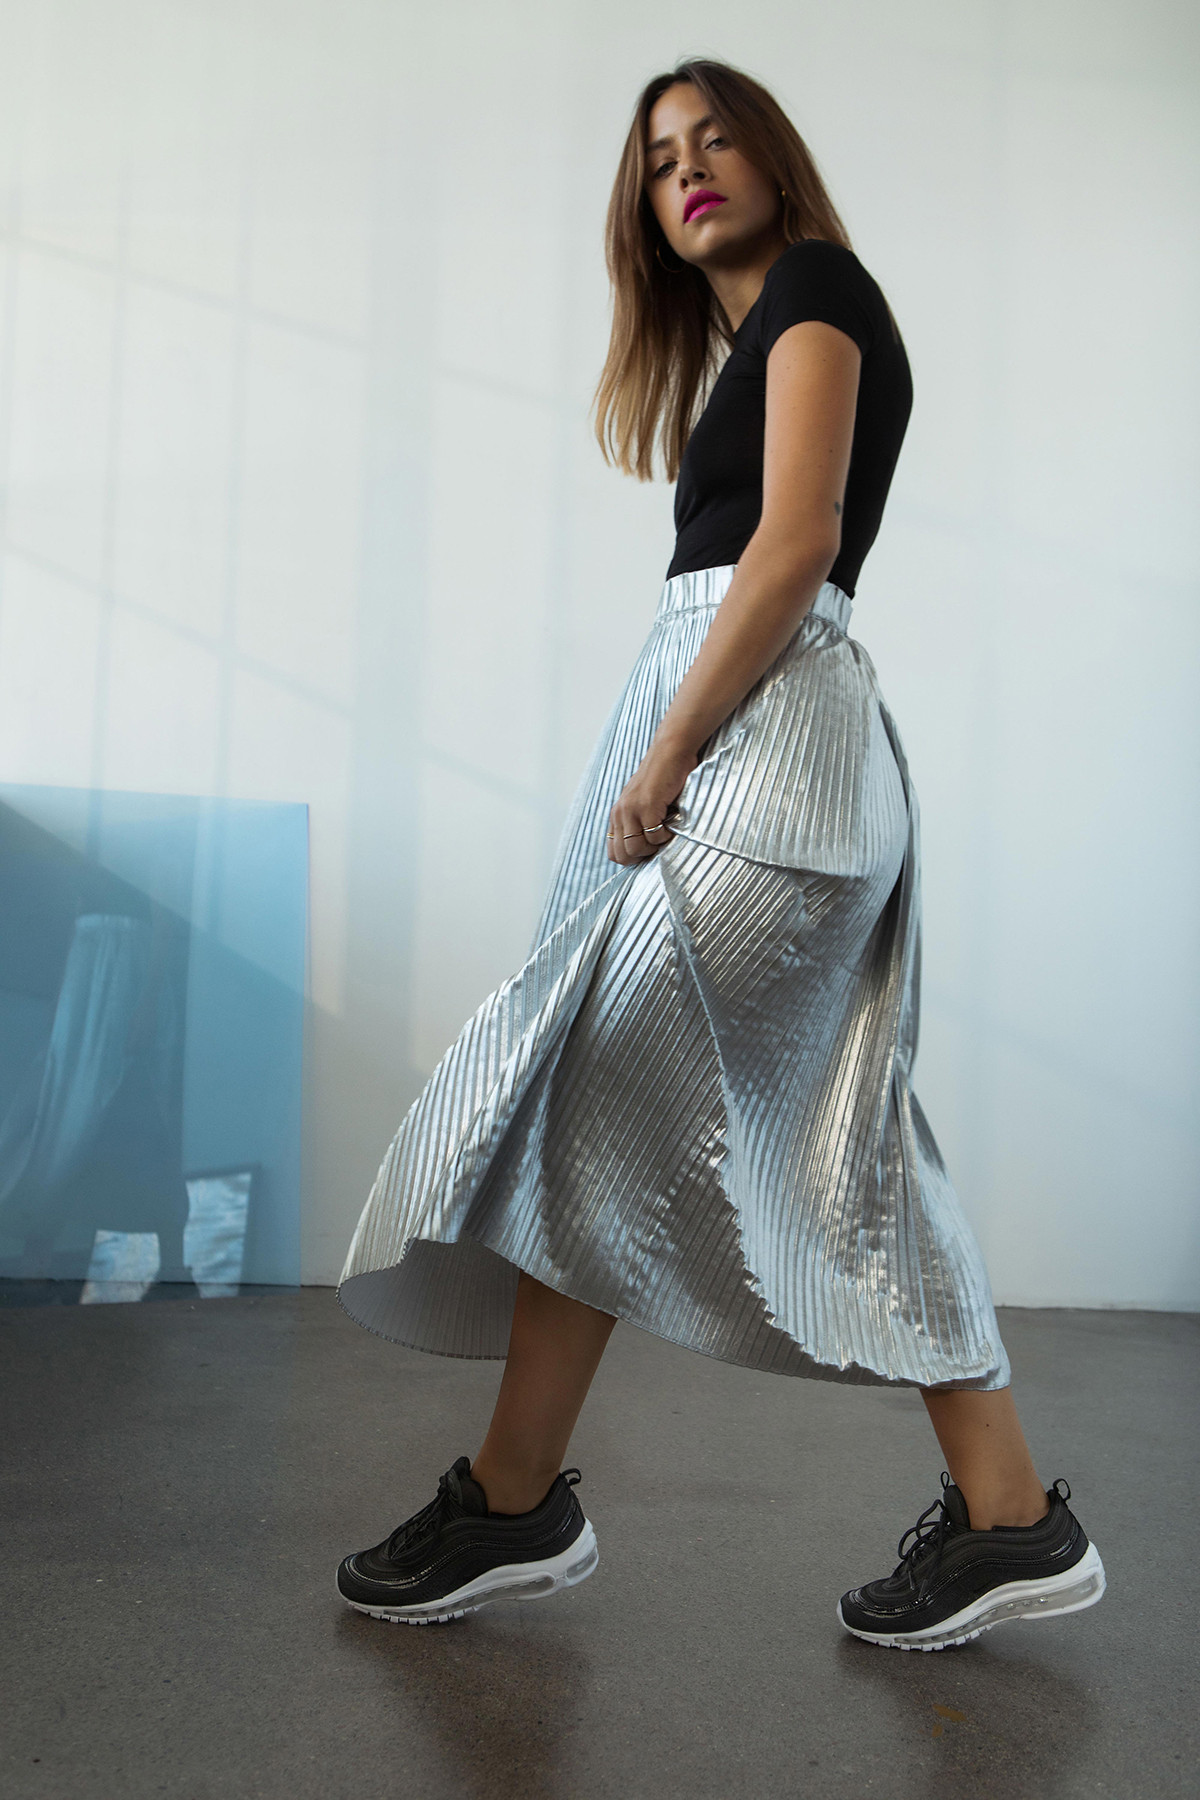 nike 97 fashion